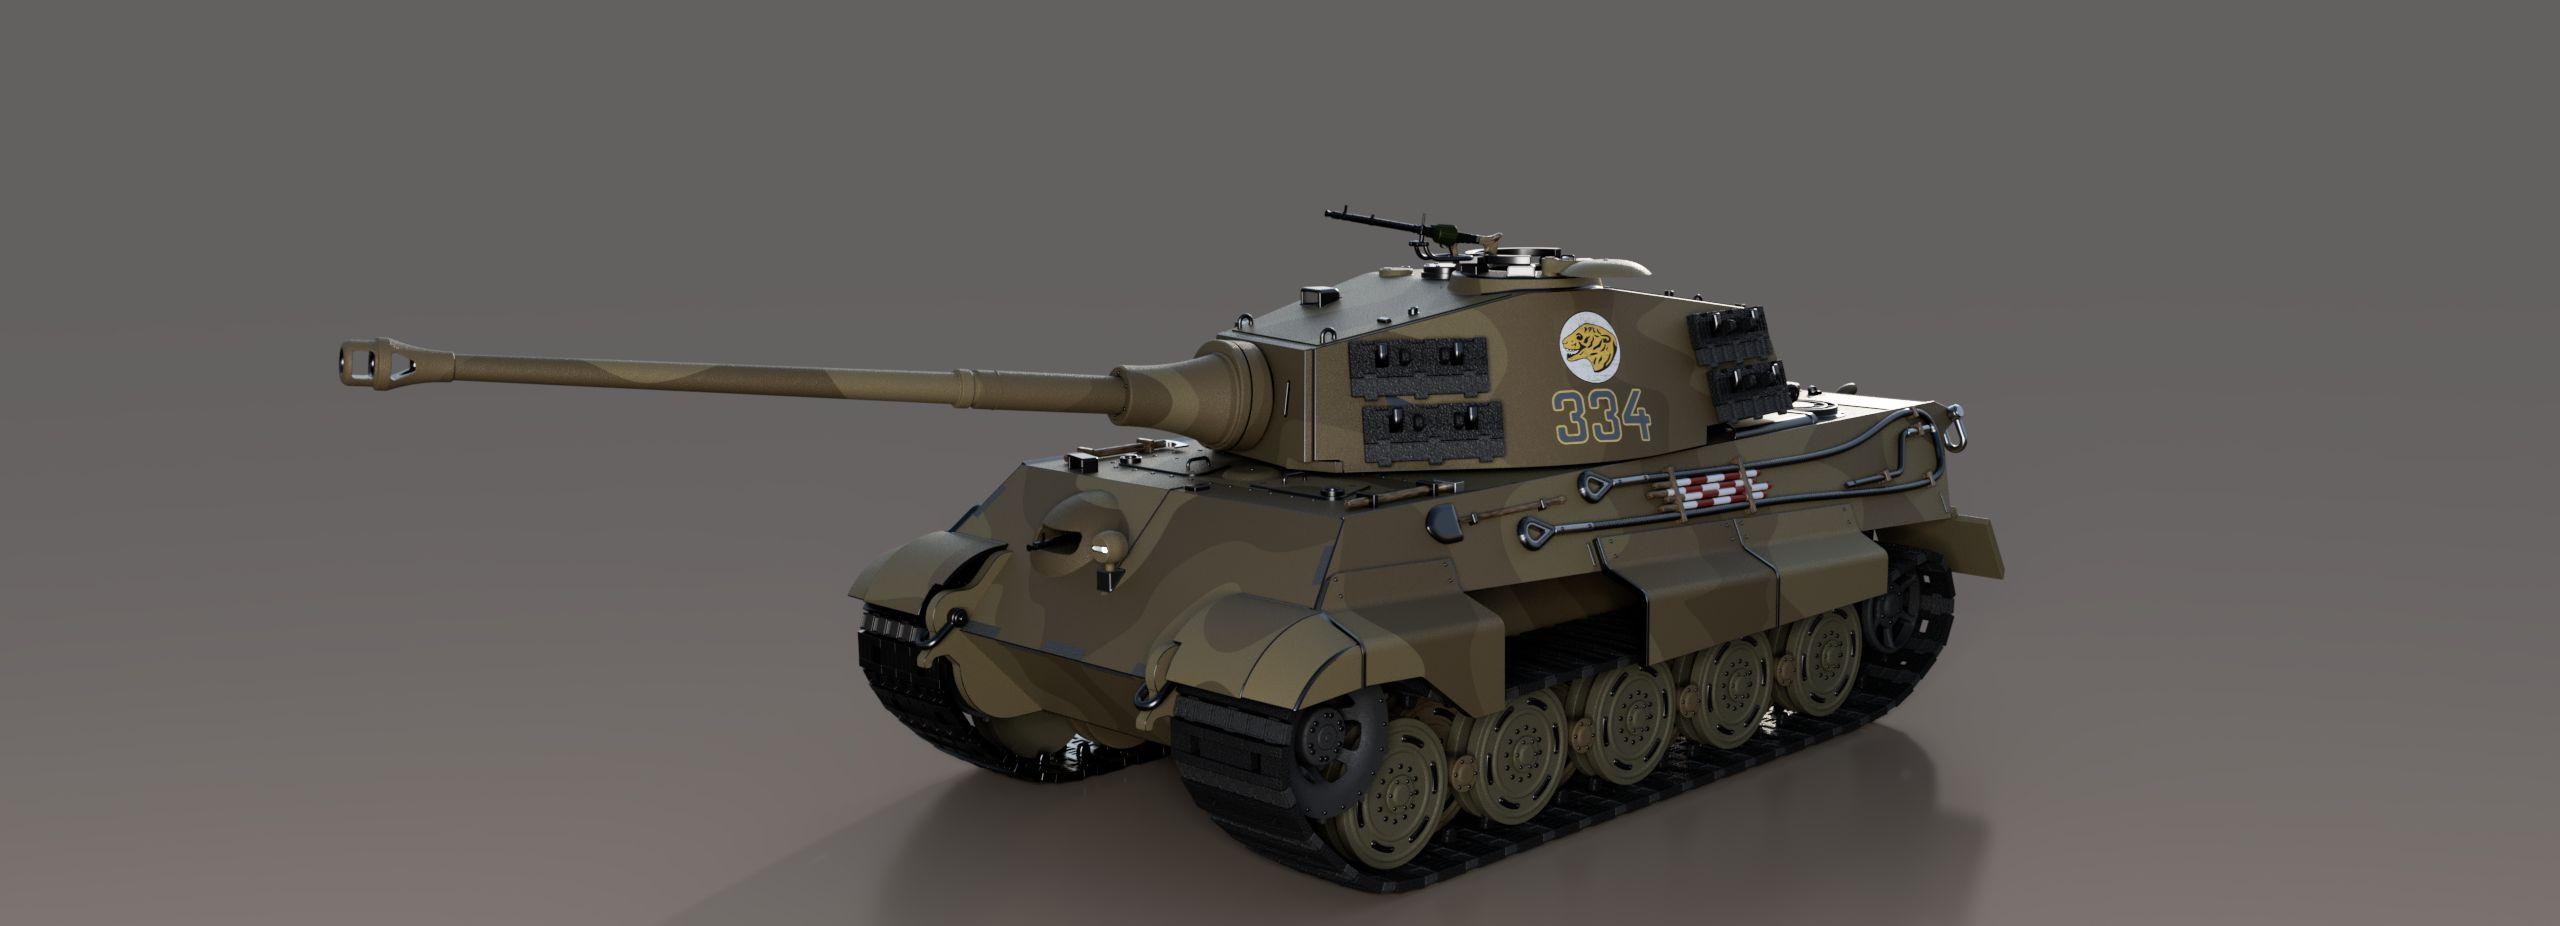 Tiger-ii-komplett-wuste-2018-sep-20-08-13-56am-000-customizedview13429831278-png-3500-3500